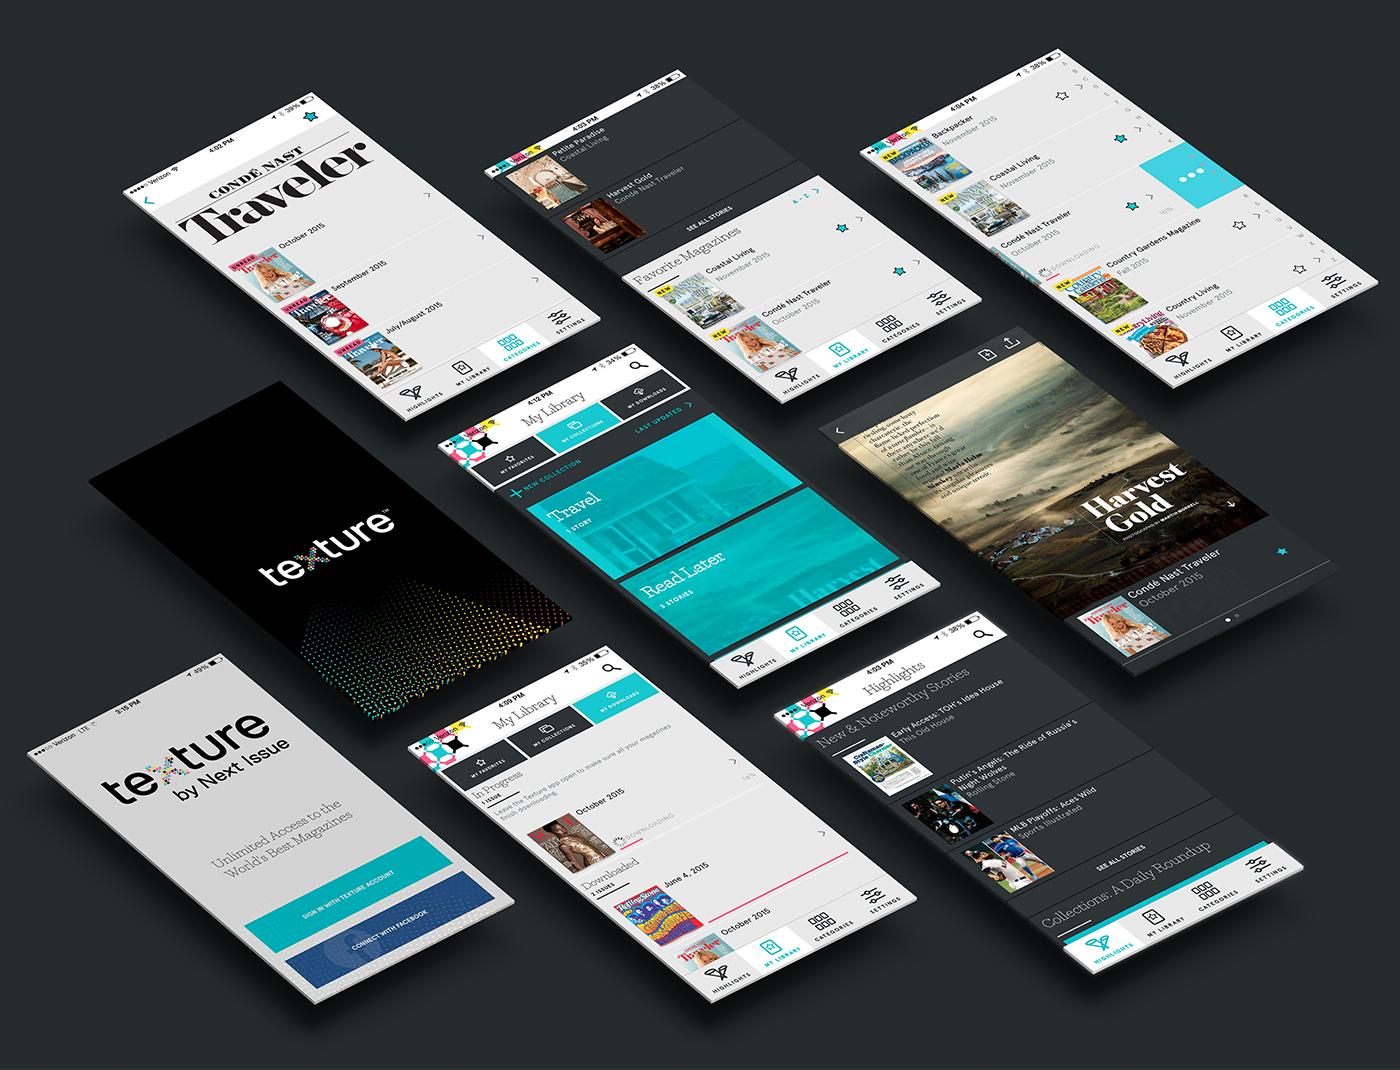 metadesign MetaDesignSF san francisco texture Next Issue Media Brand Design app design motion design iPad App Mobile app magazines interface design UI ux Modular branding